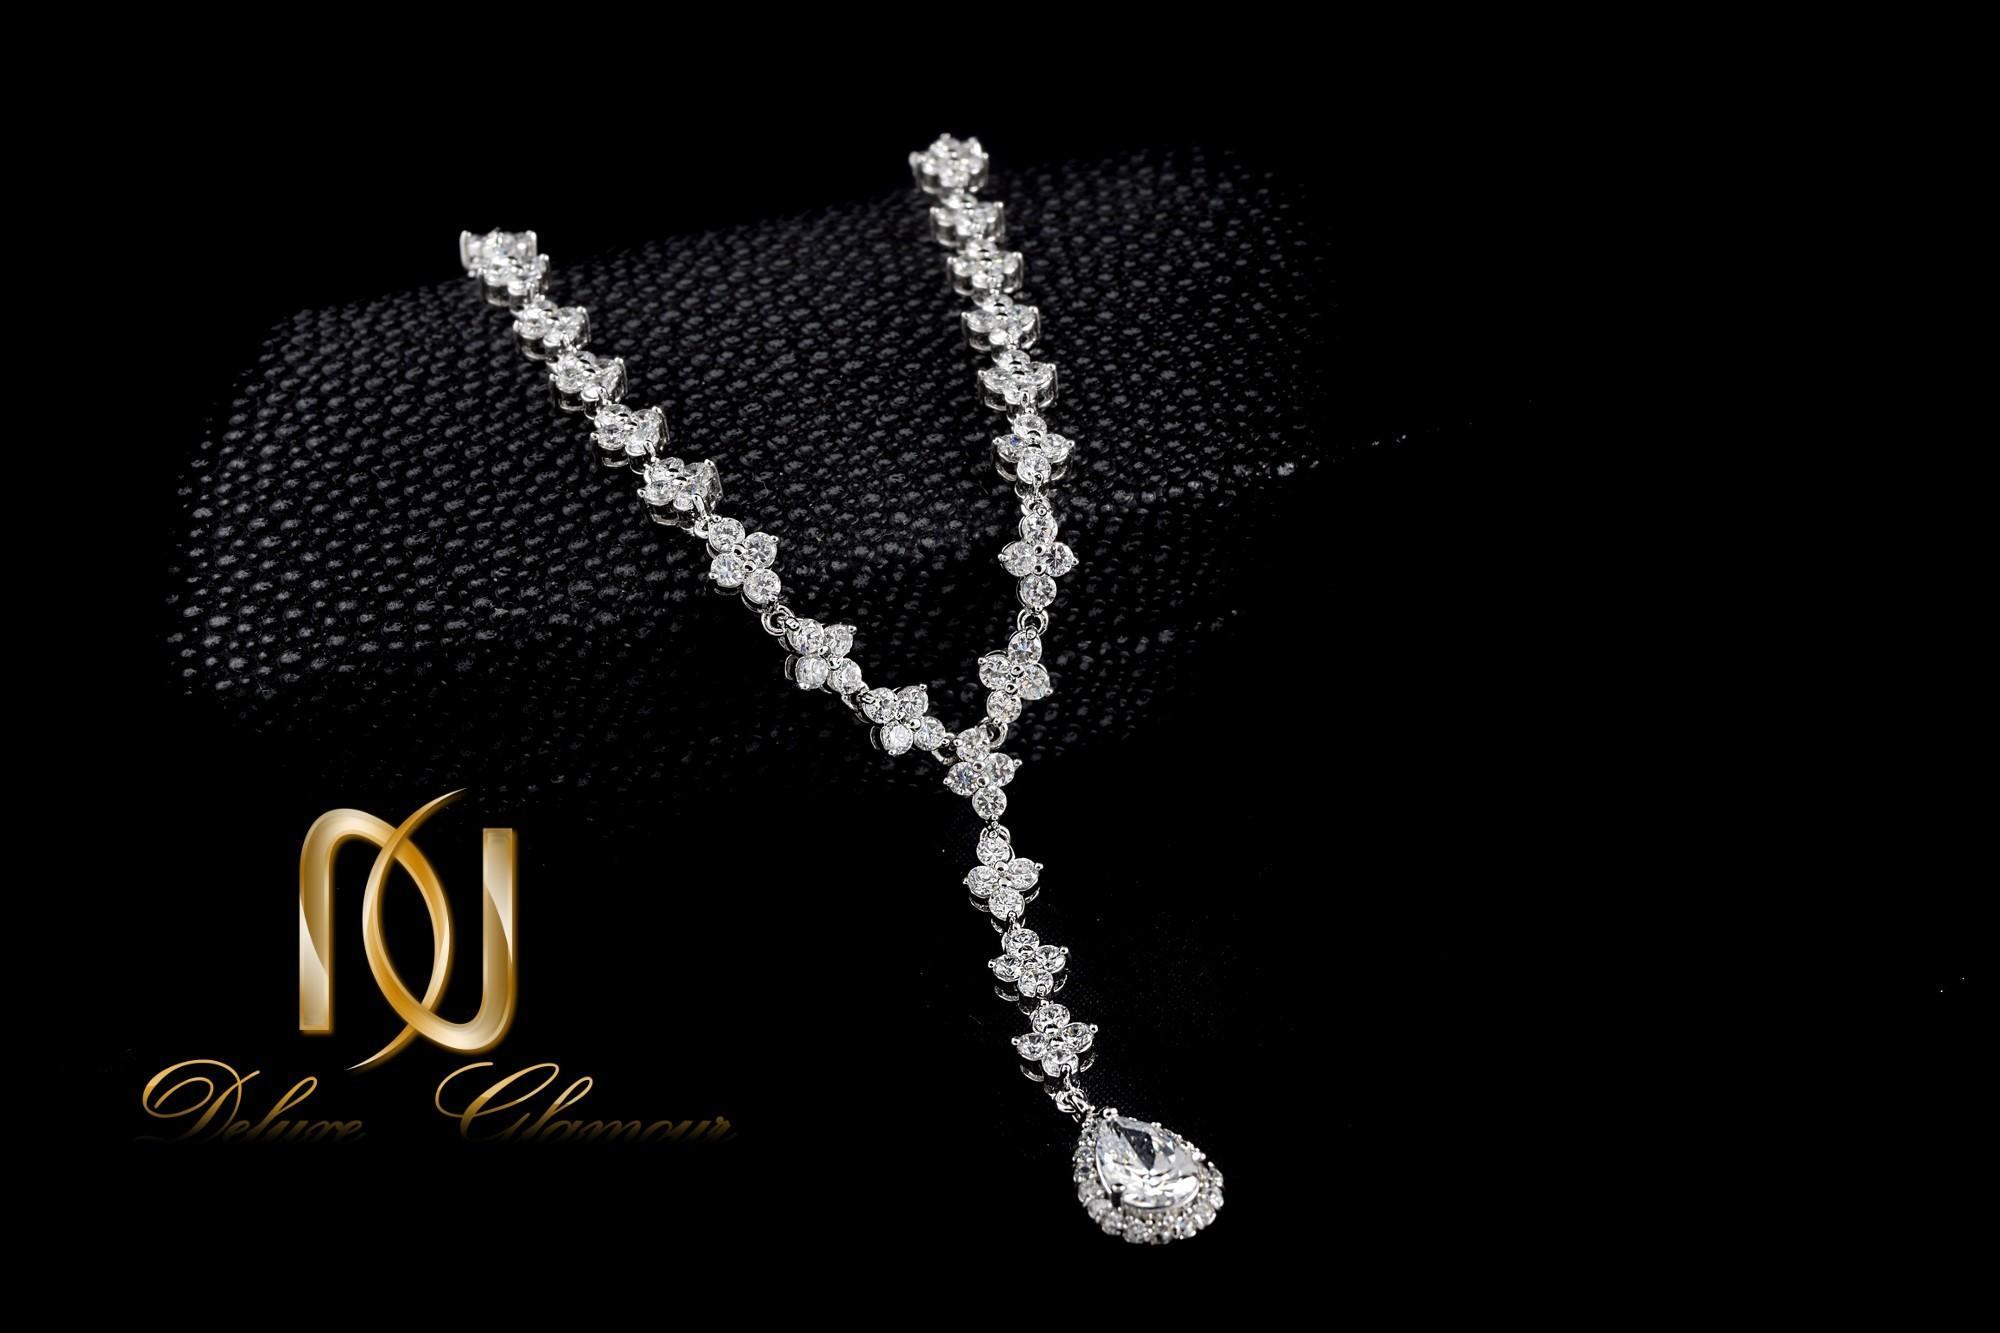 نیم ست جواهري عروس کلیو با کریستالهای سواروسکی Ns-n202 (4)